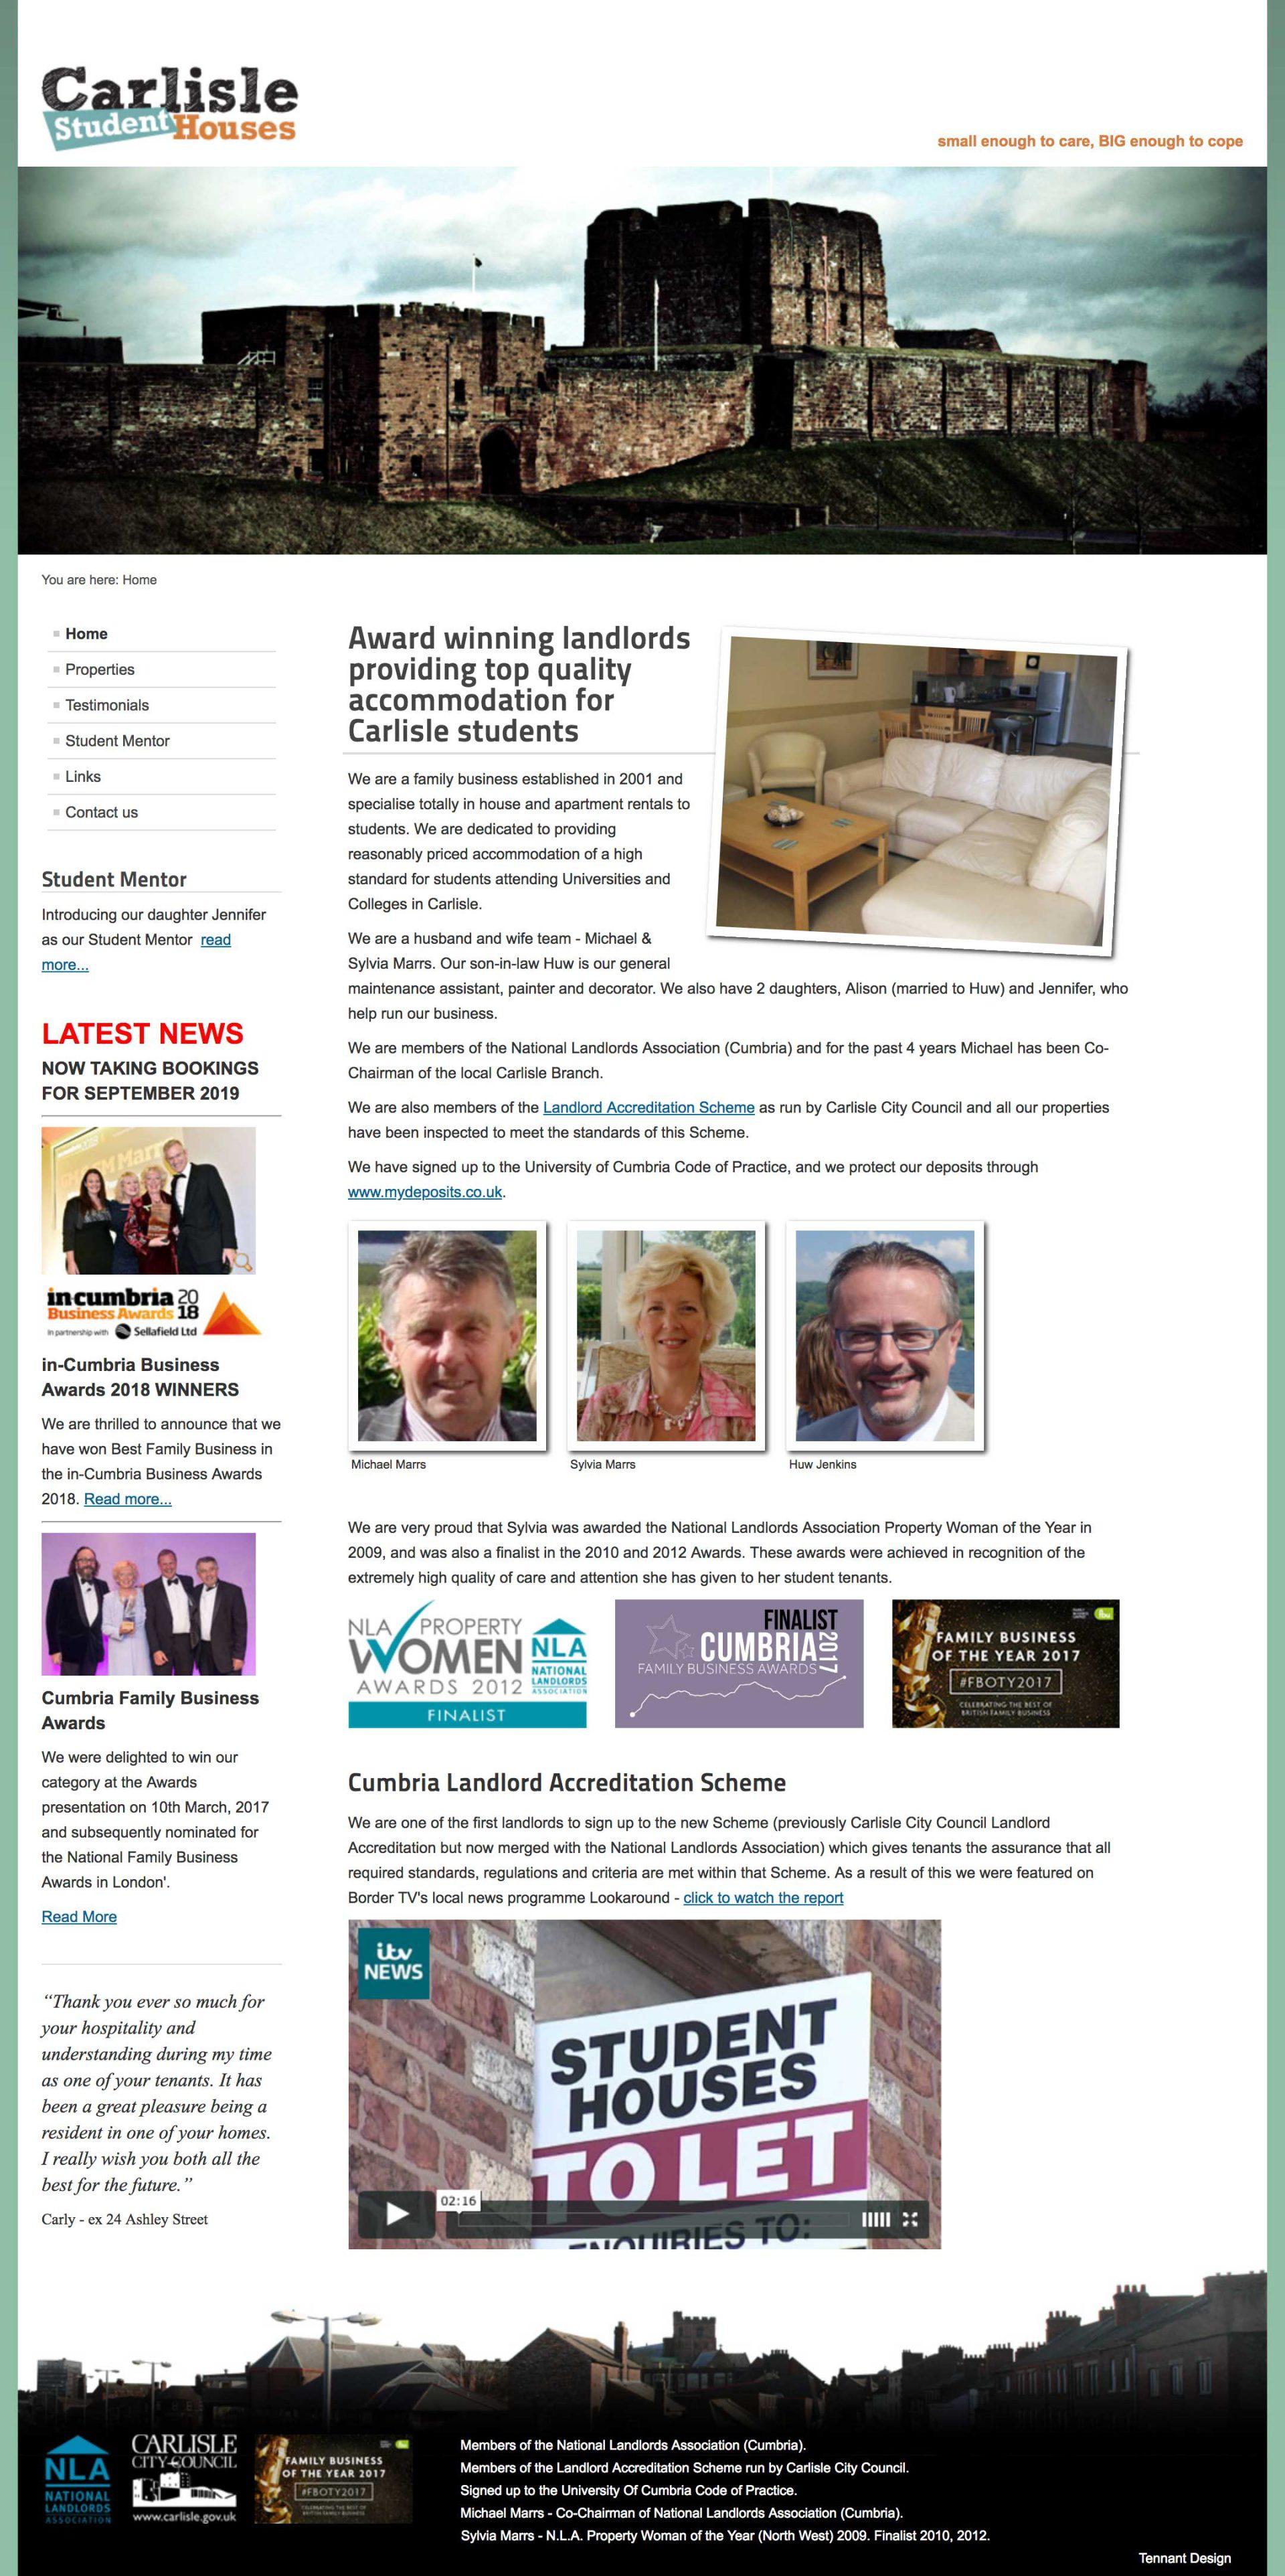 website design - carlisle student houses